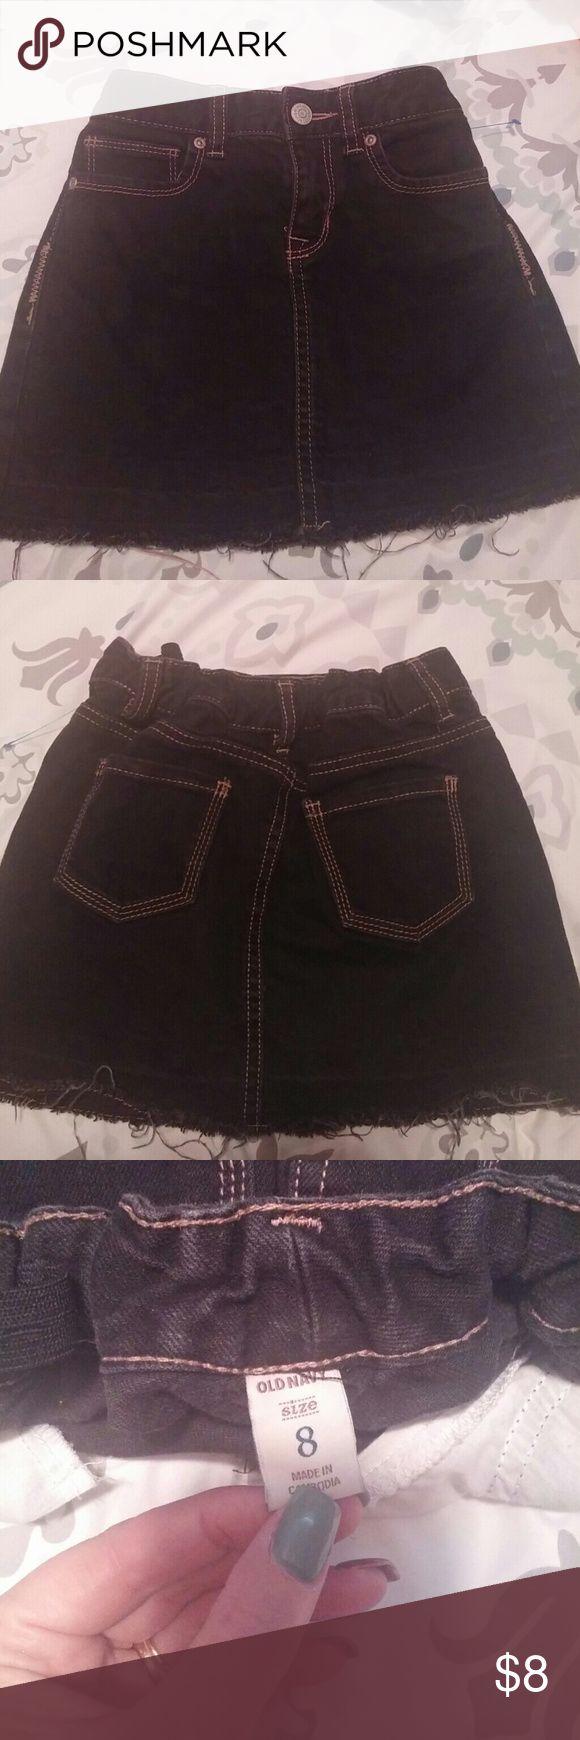 Little girls black jean shirt Old Navy black jean skirt with adjustable waist Old Navy Bottoms Skirts